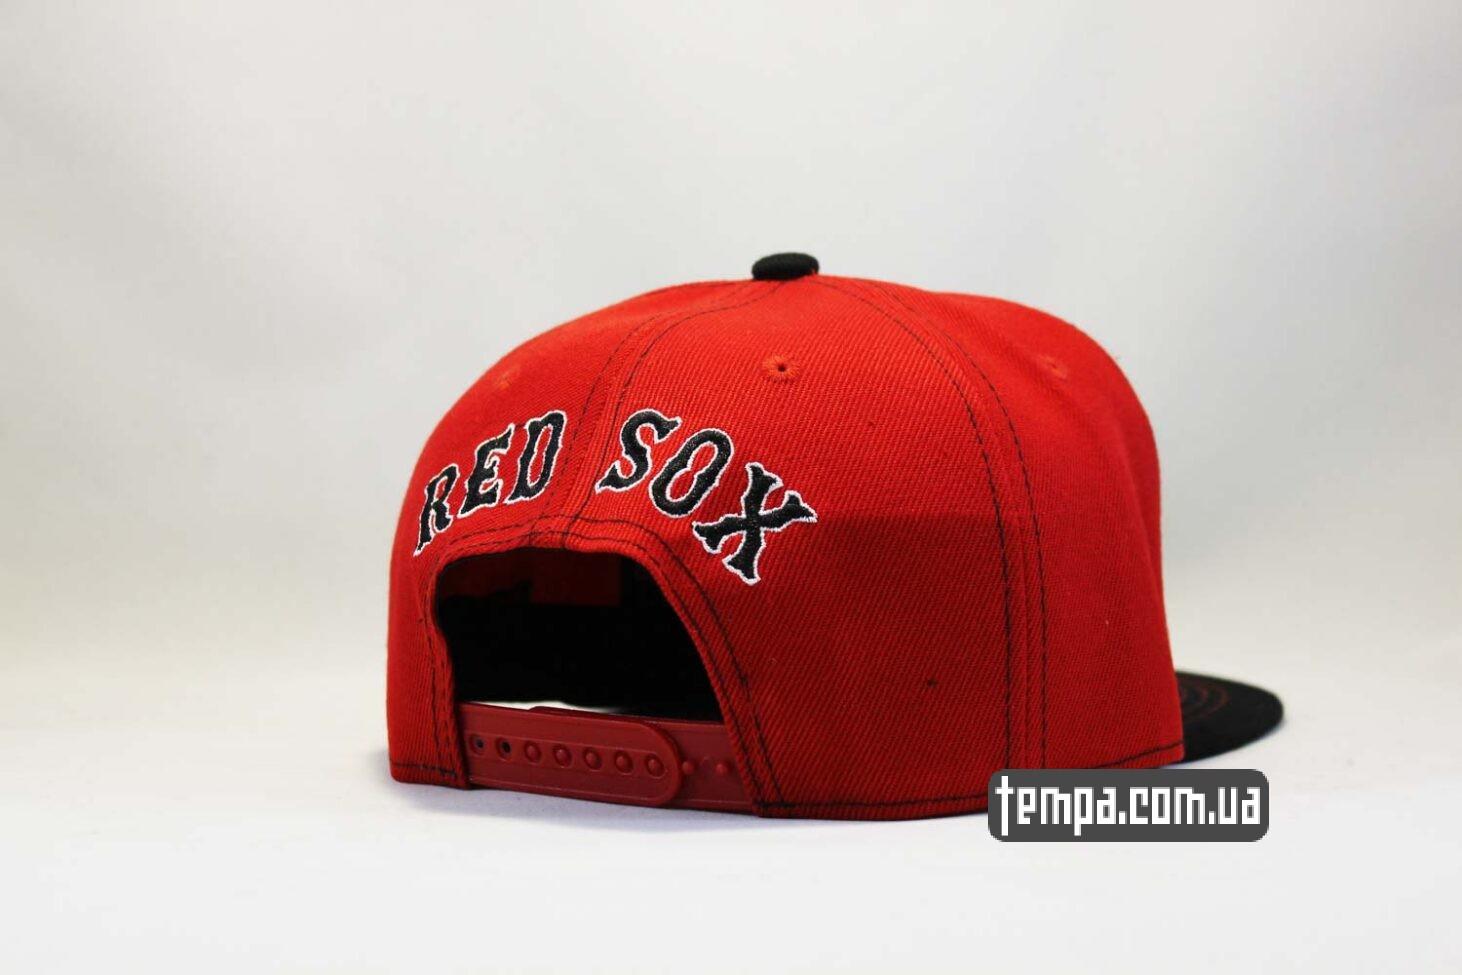 бейсбол одежда кепка snapback Boston NewEra 9fifty бостон бейсбокла купить красно-серая